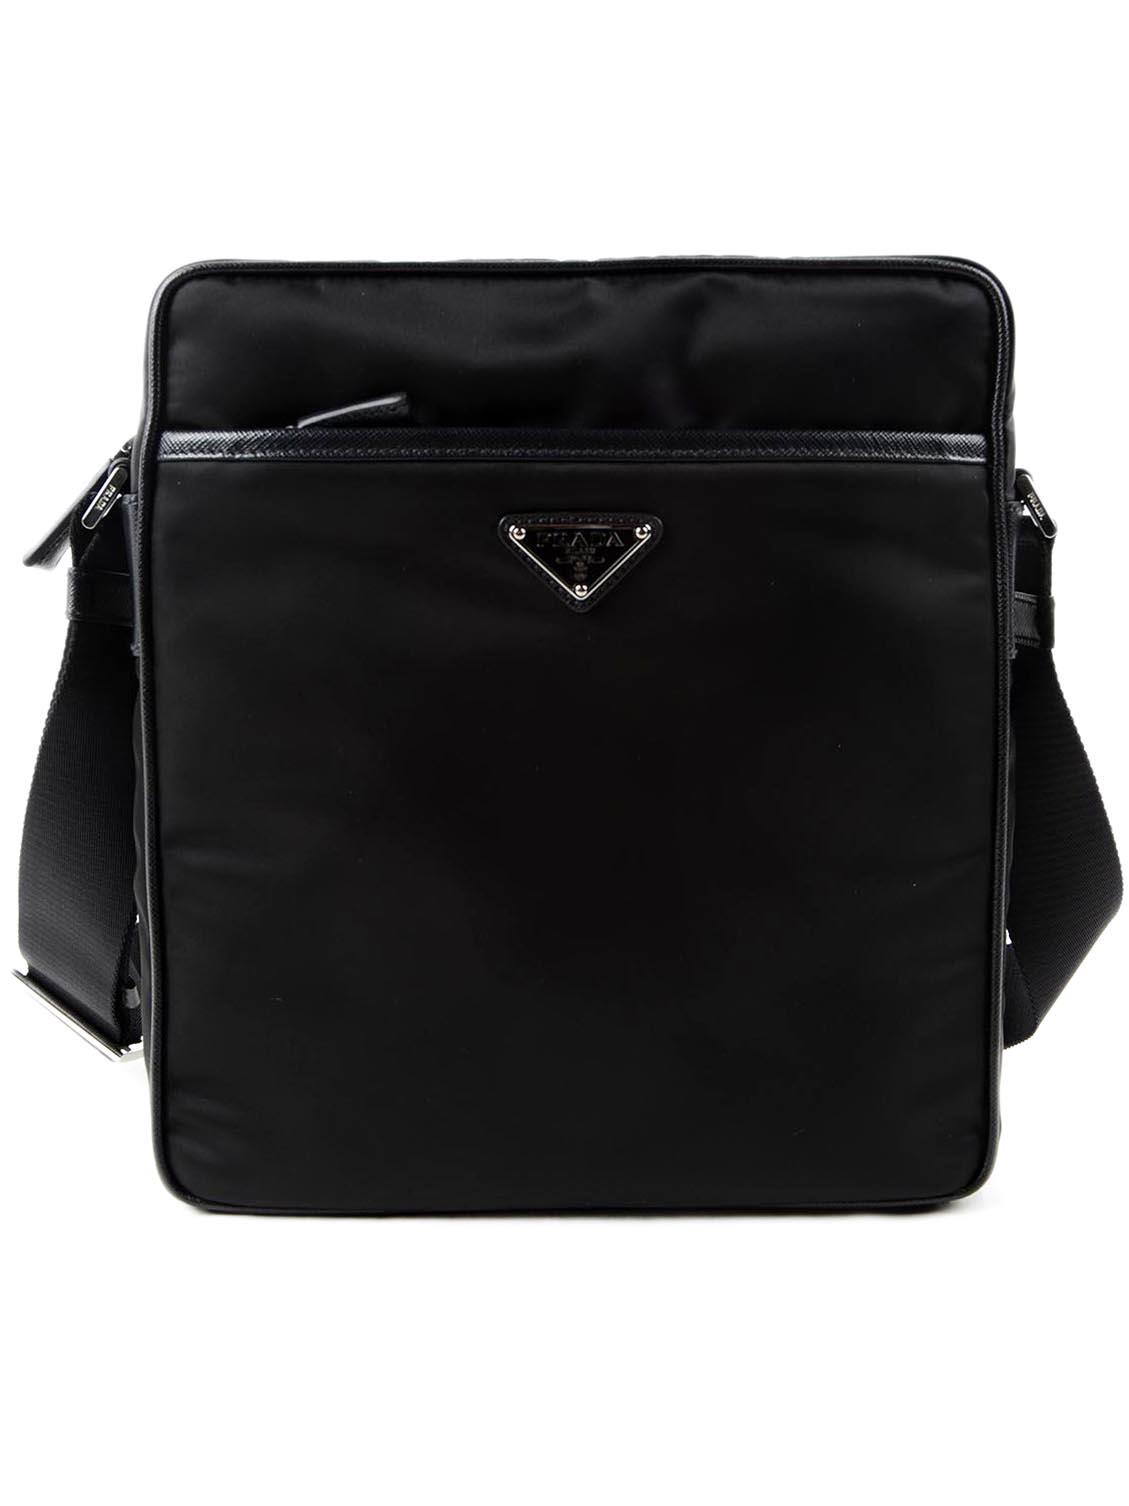 0c0ba527988f italist | Best price in the market for Prada Prada Saffiano Shoulder ...